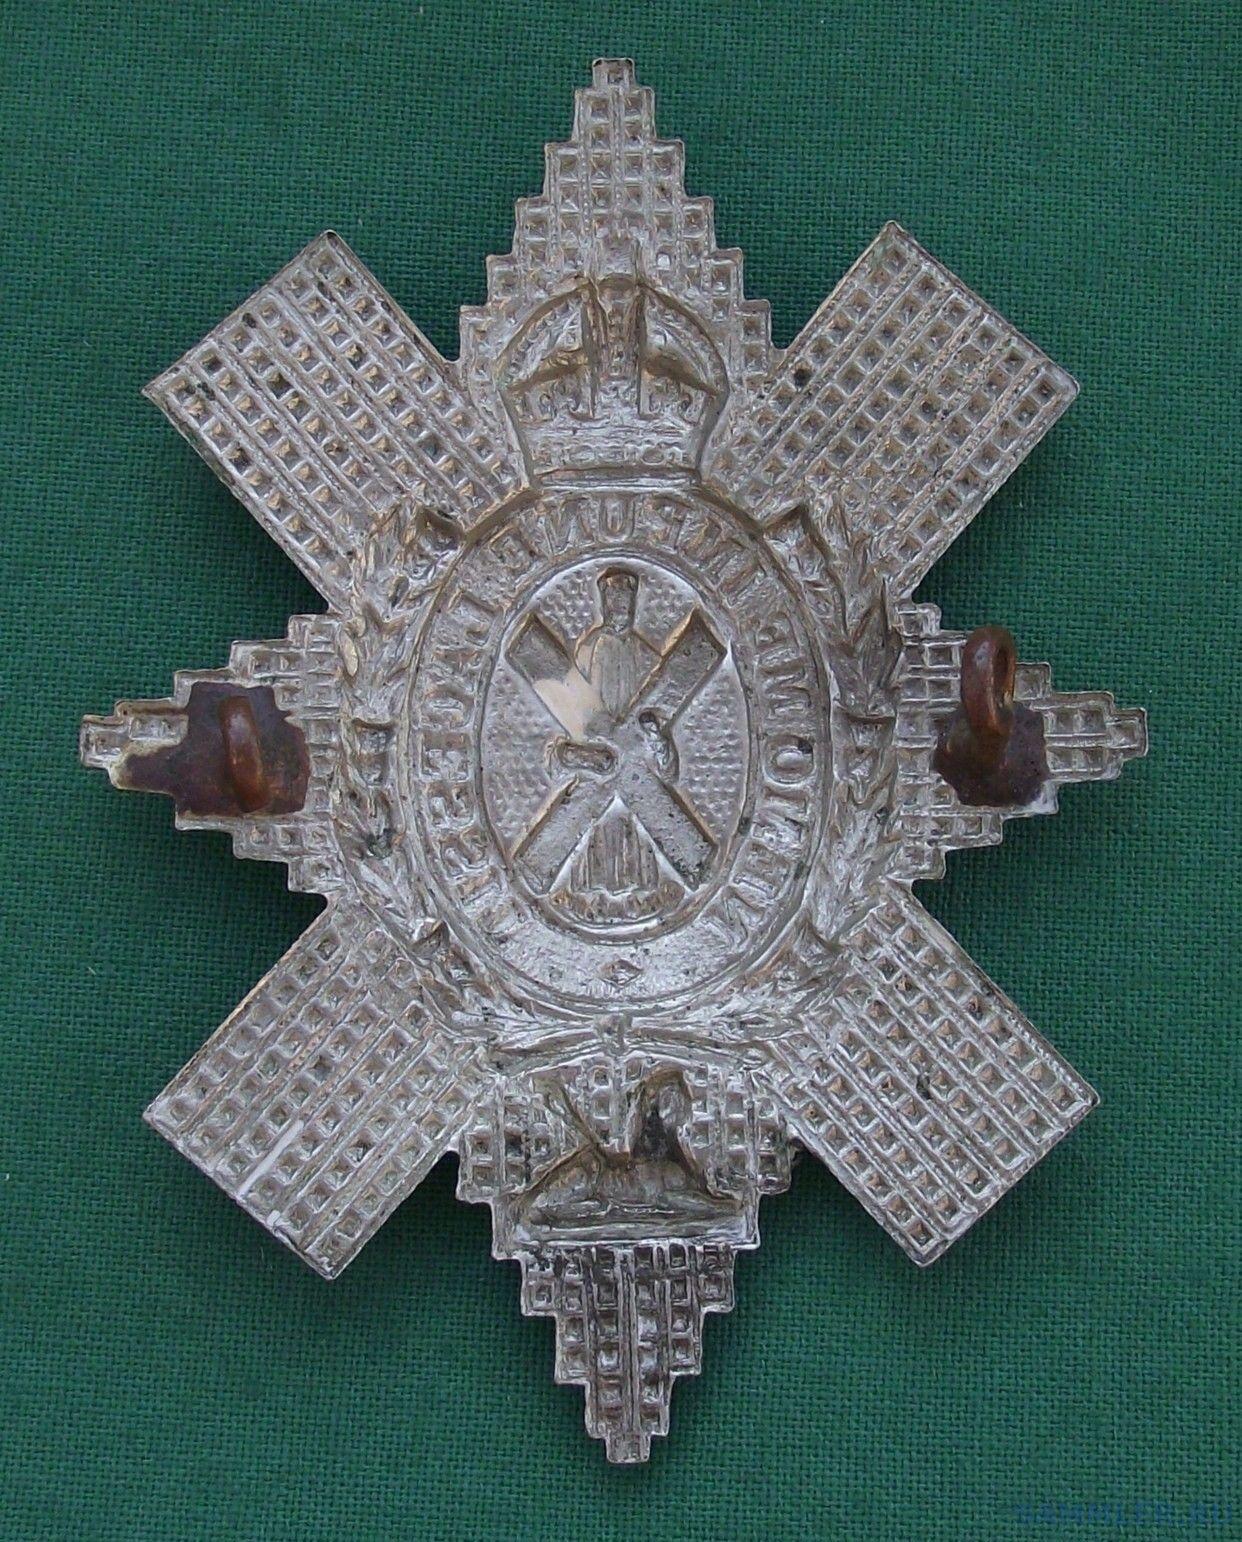 The-Black-Watch-100-Genuine-WW2-British-_57 (1).jpg